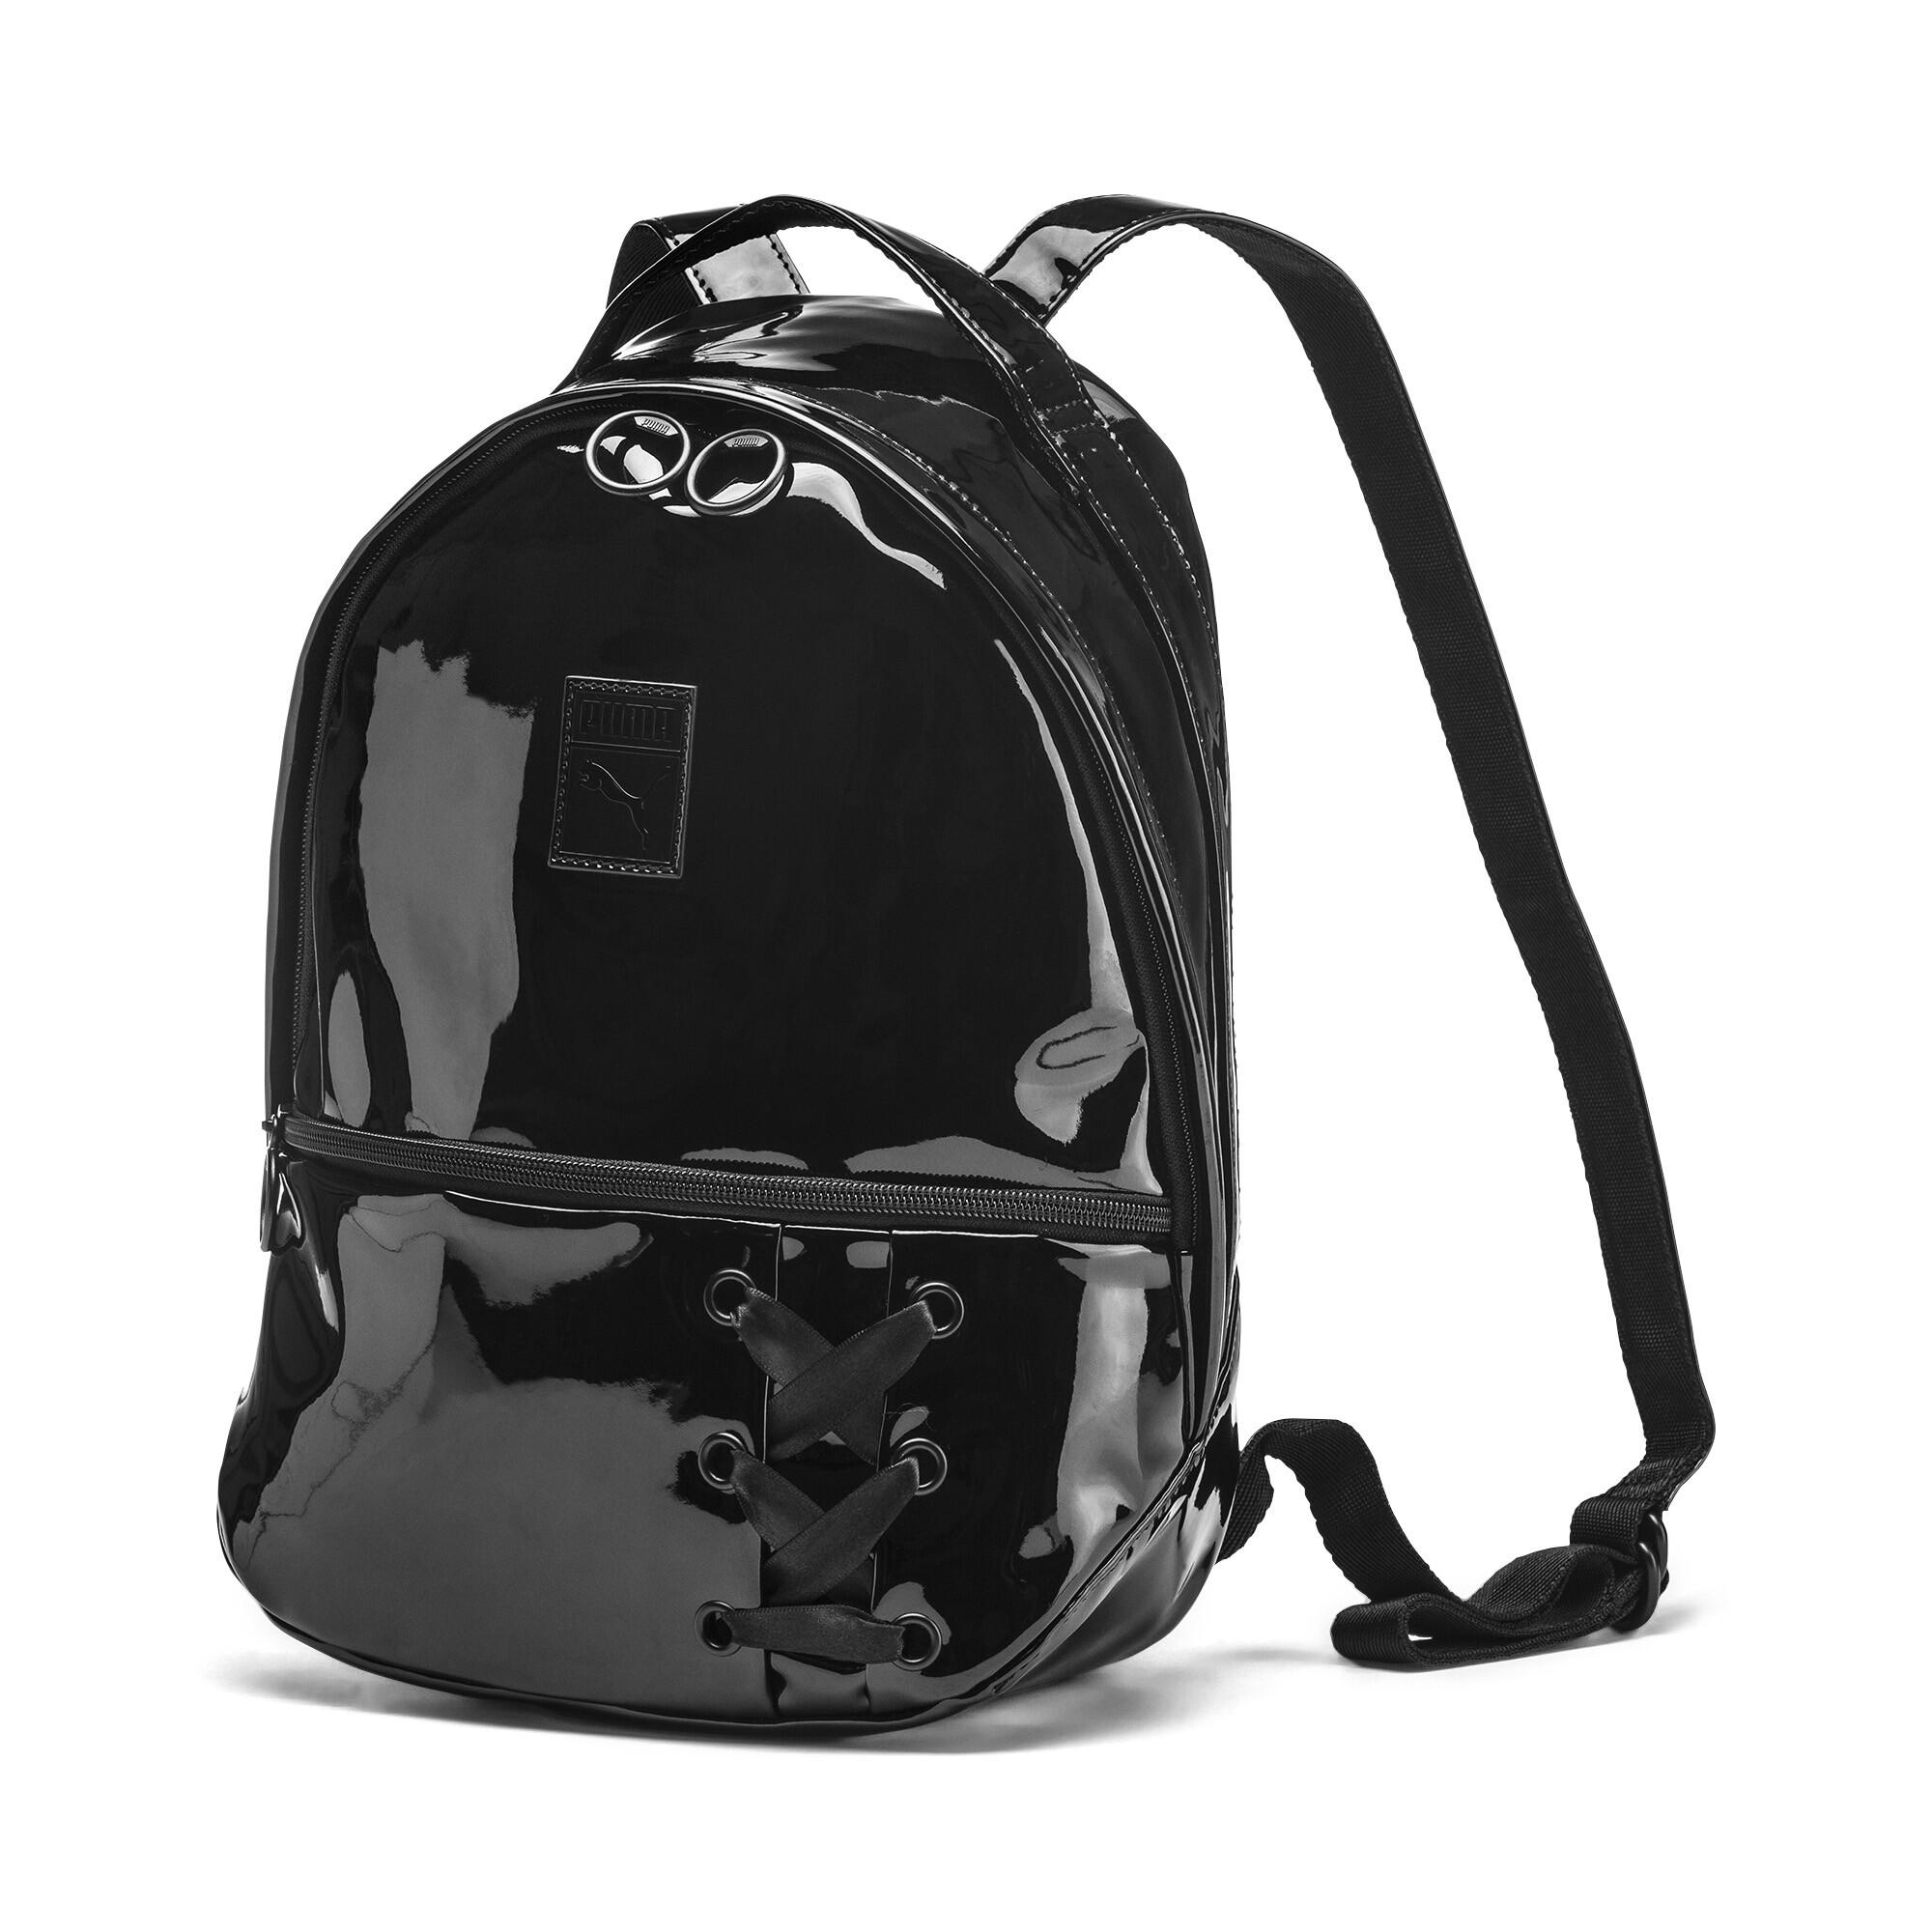 972ada505 Backpacks & Bags - Accessories - Womens